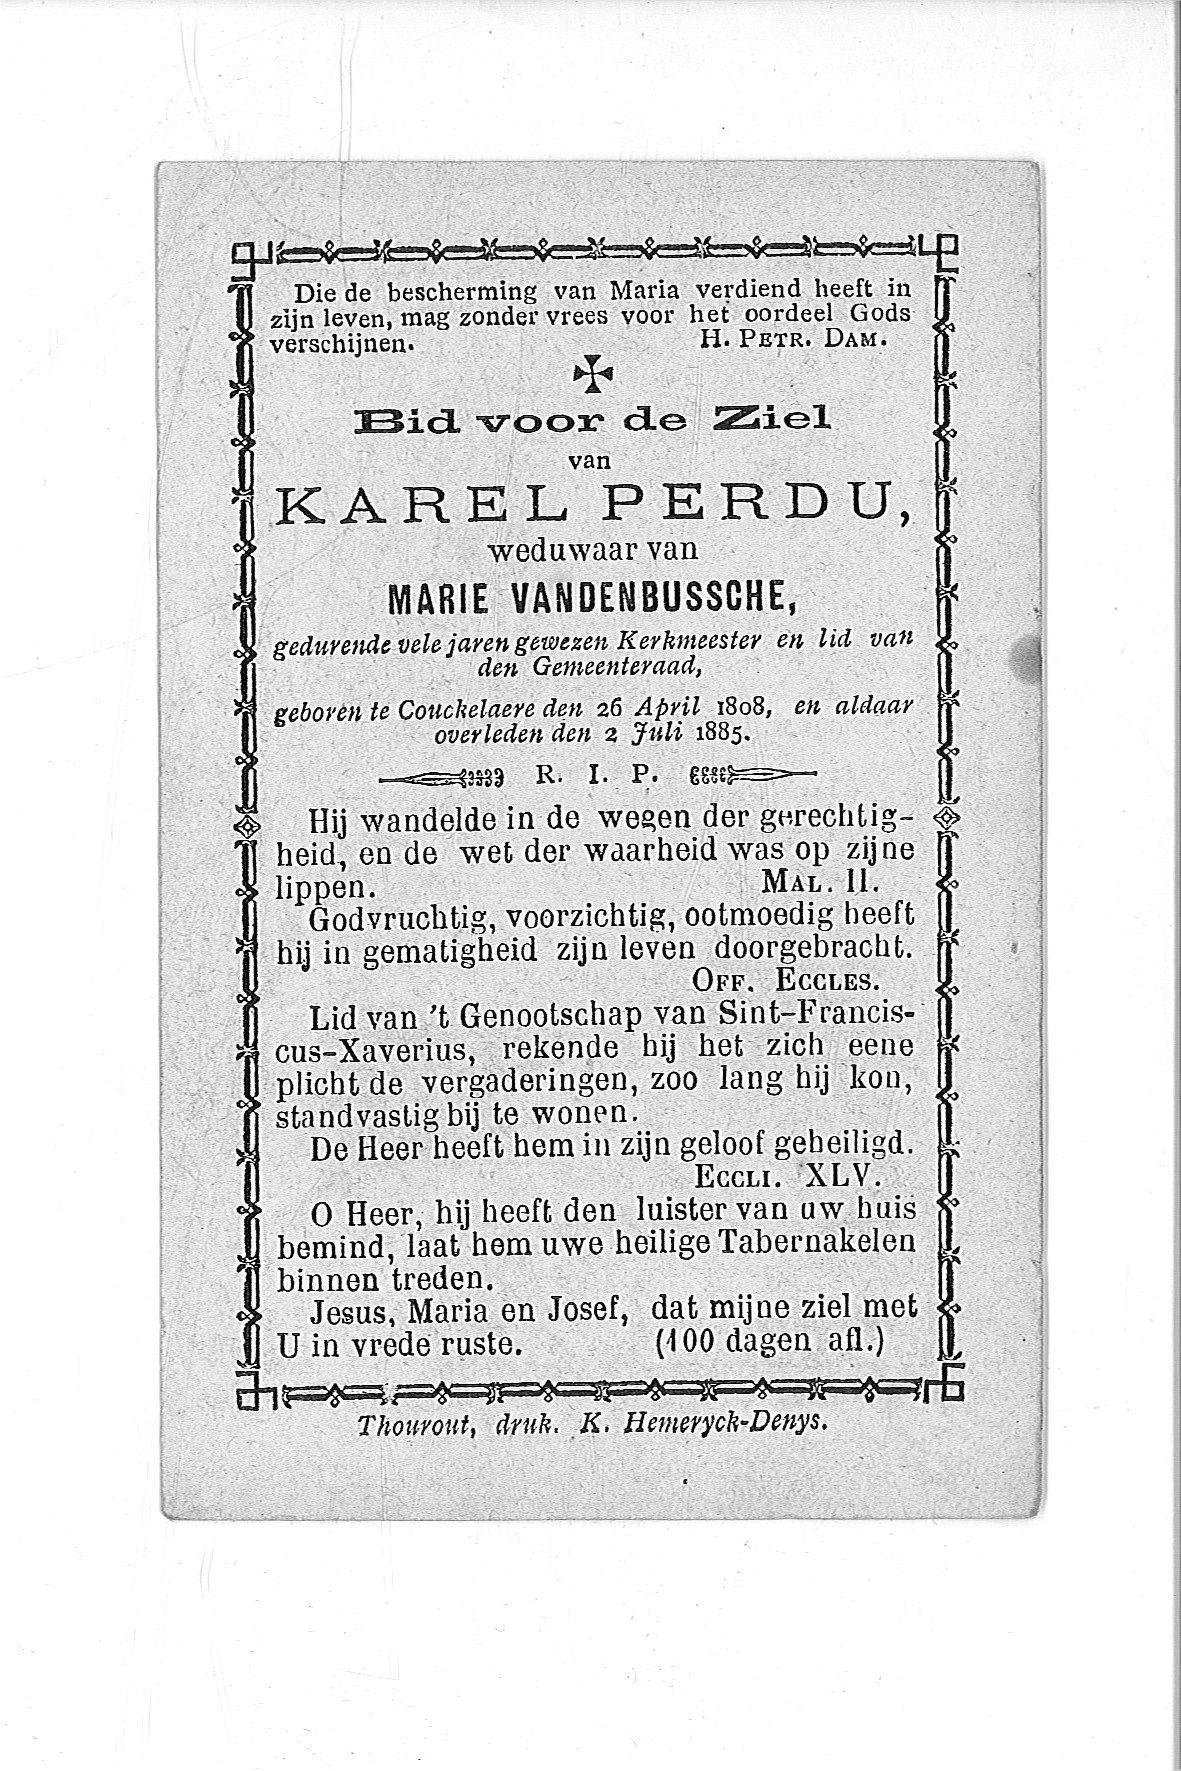 Karel(1885)20090804094259_00003.jpg